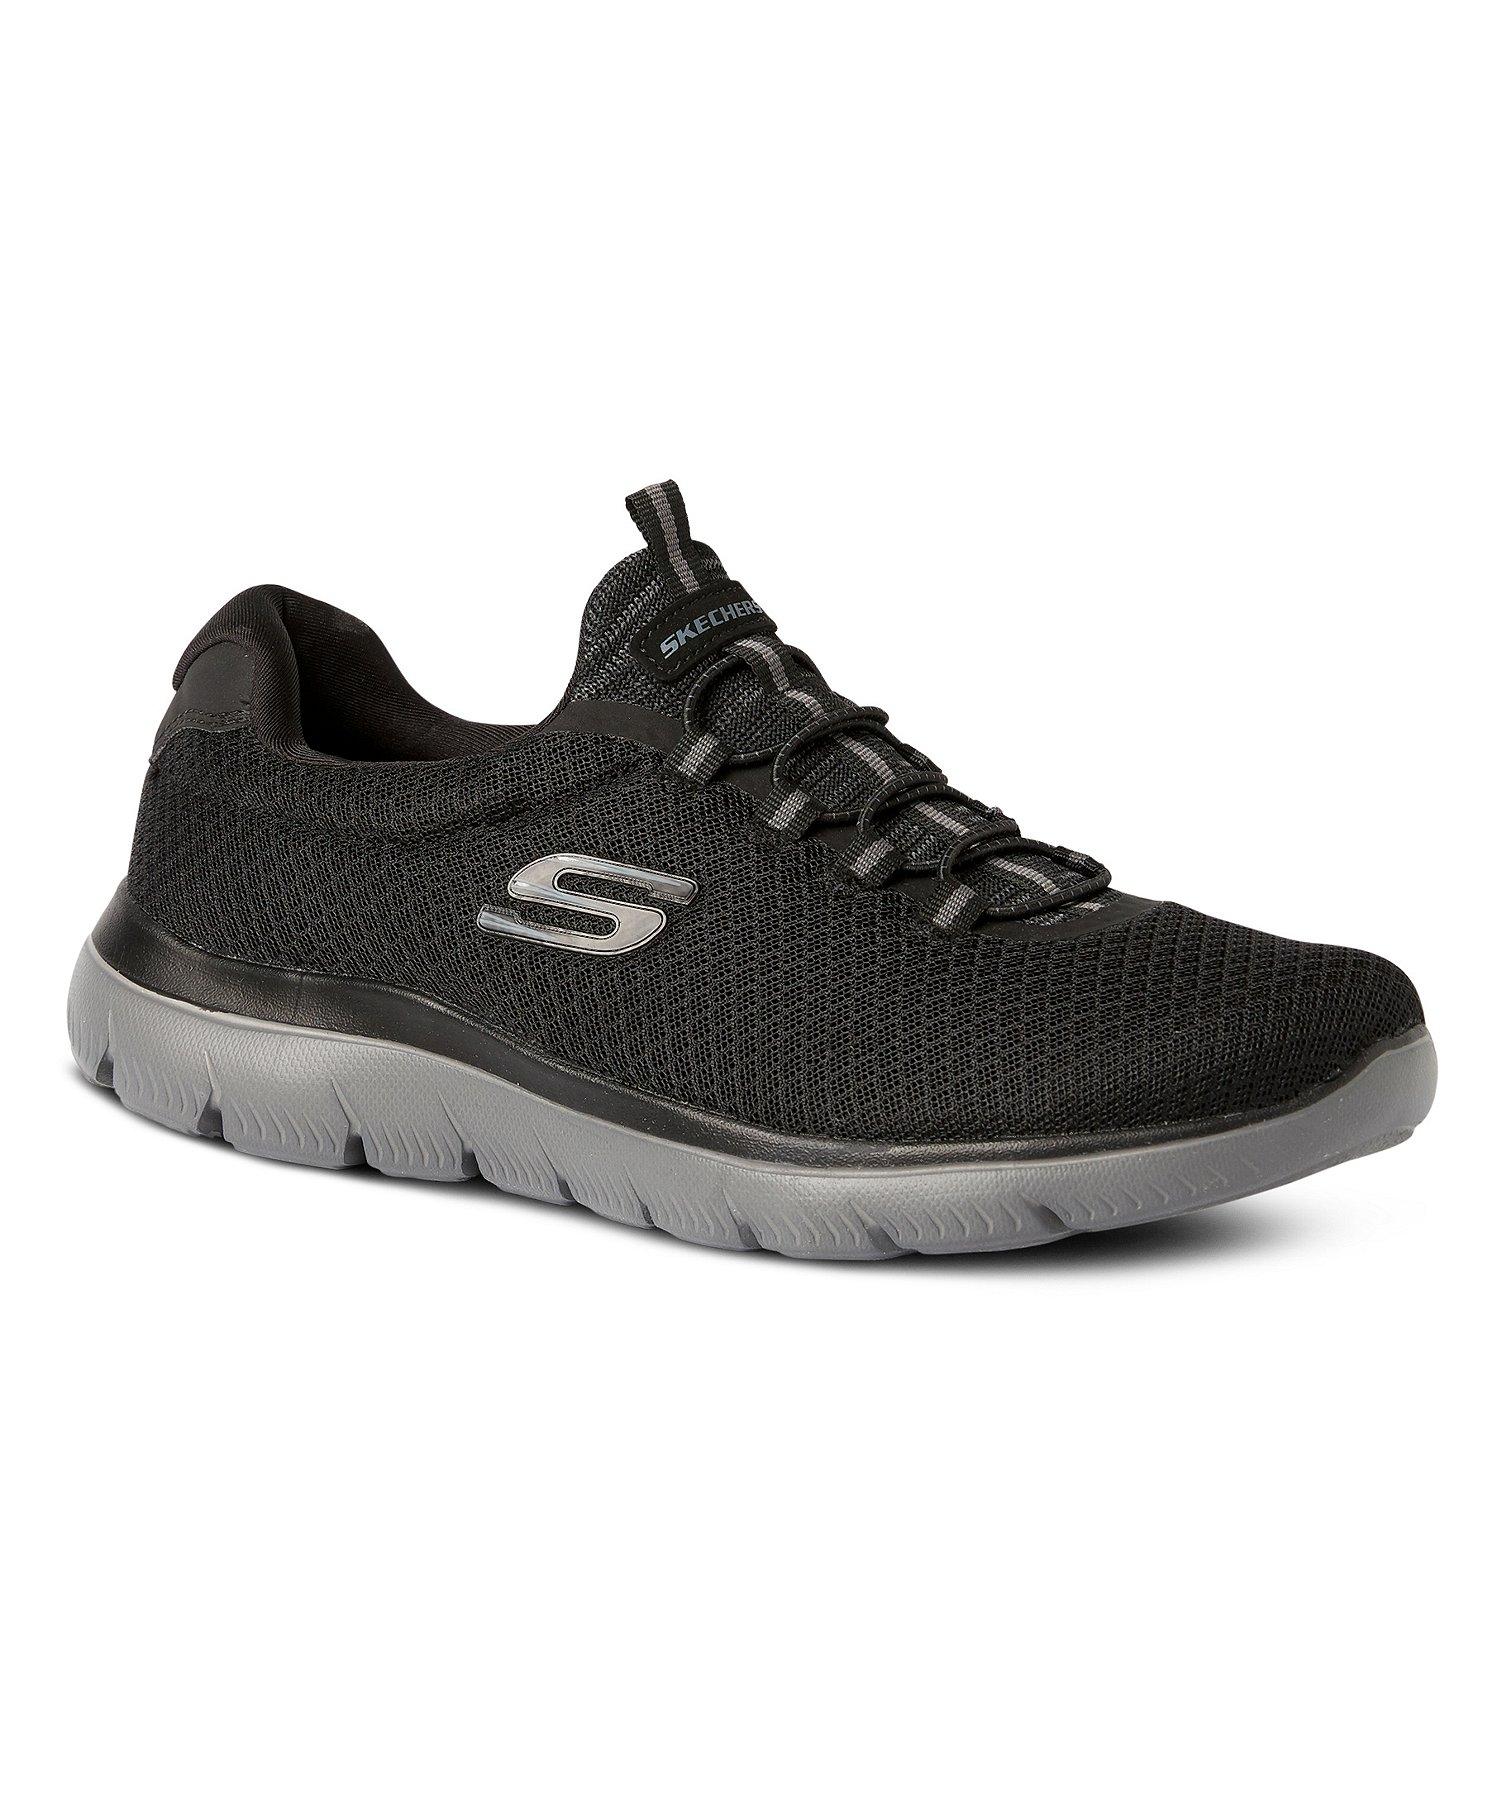 Molester Aja ligado  Men's Jumpstart Summits Shoes | Mark's